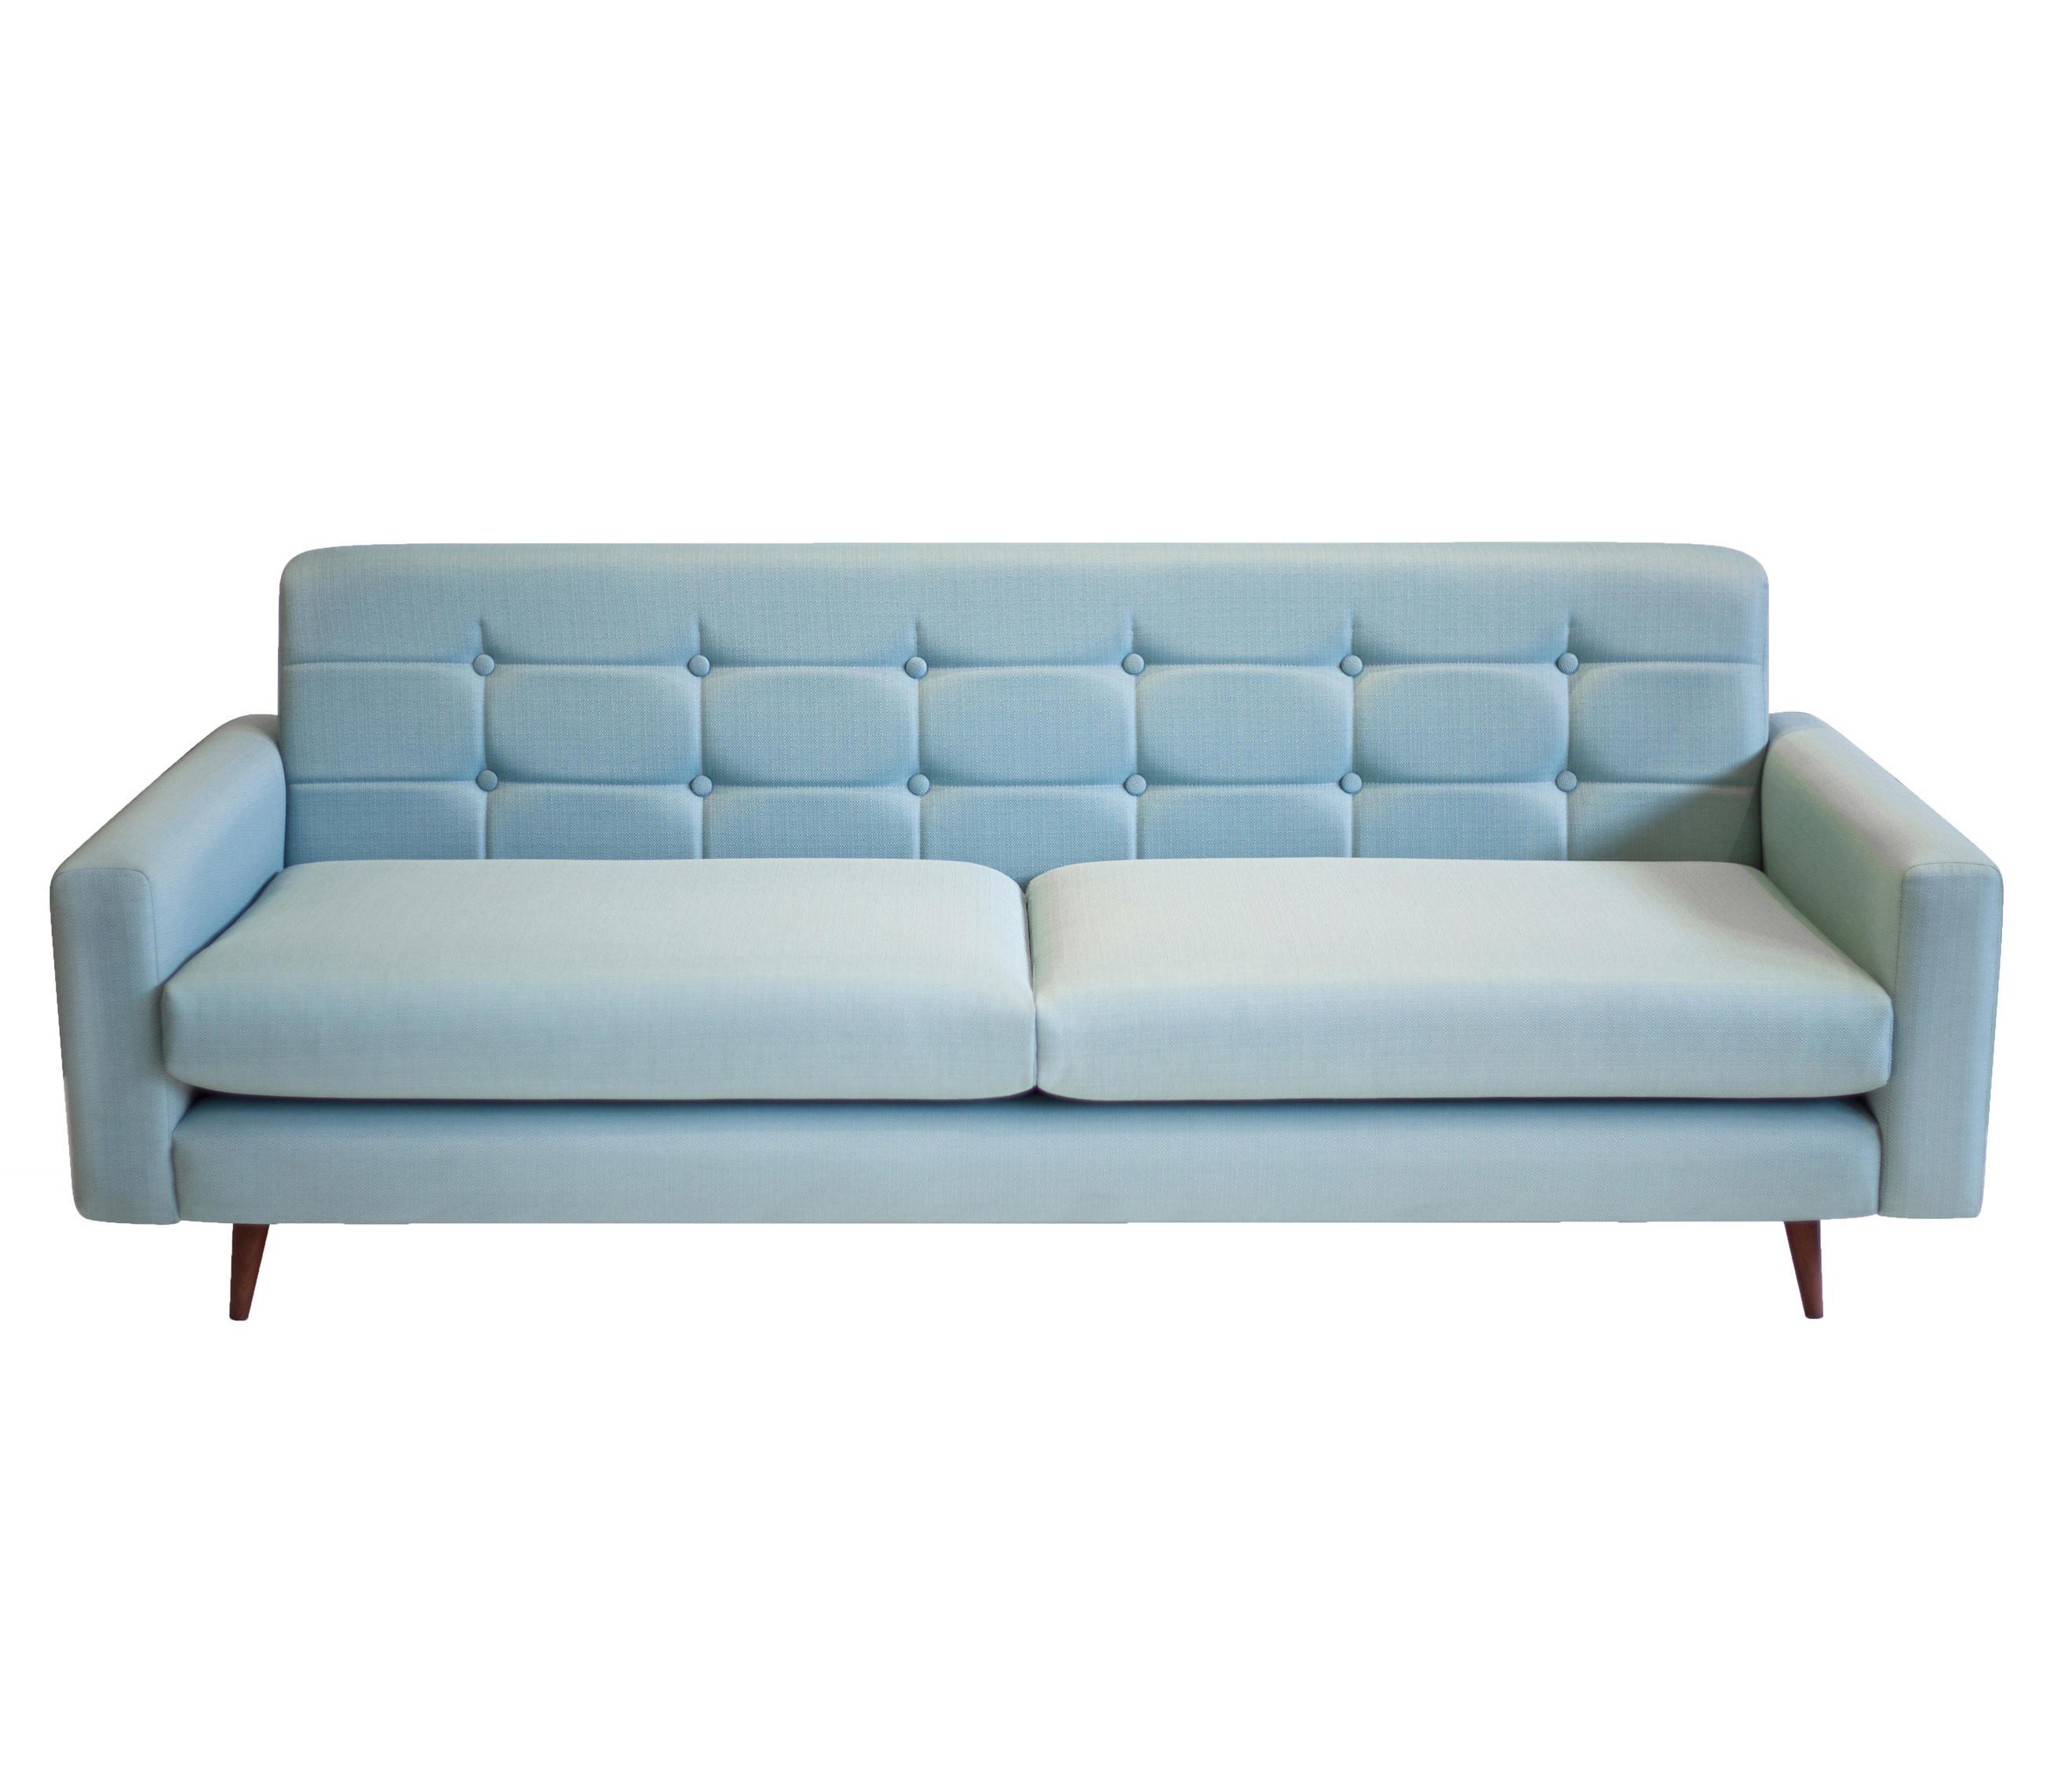 chelsea square sofa cheap sofas big lots trend bright bold velvet the design